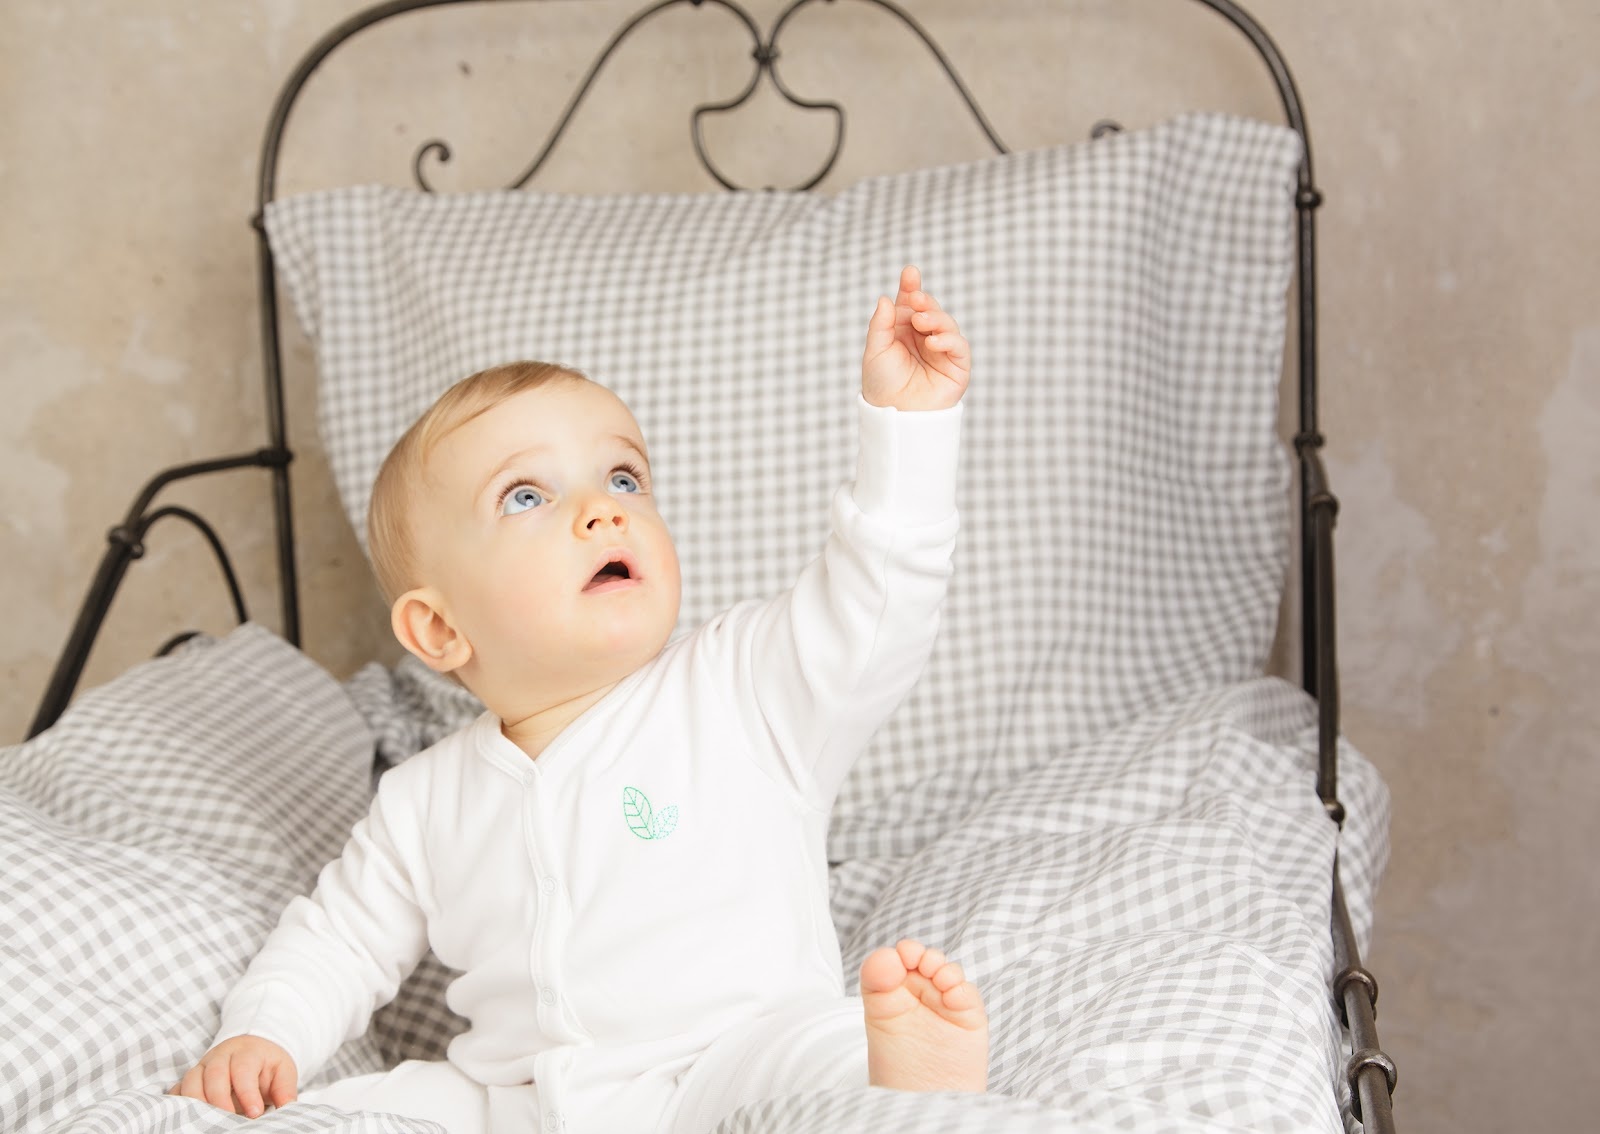 Sense Organics-Image-Basic-natural-sleepsuit-baby-8488.jpg